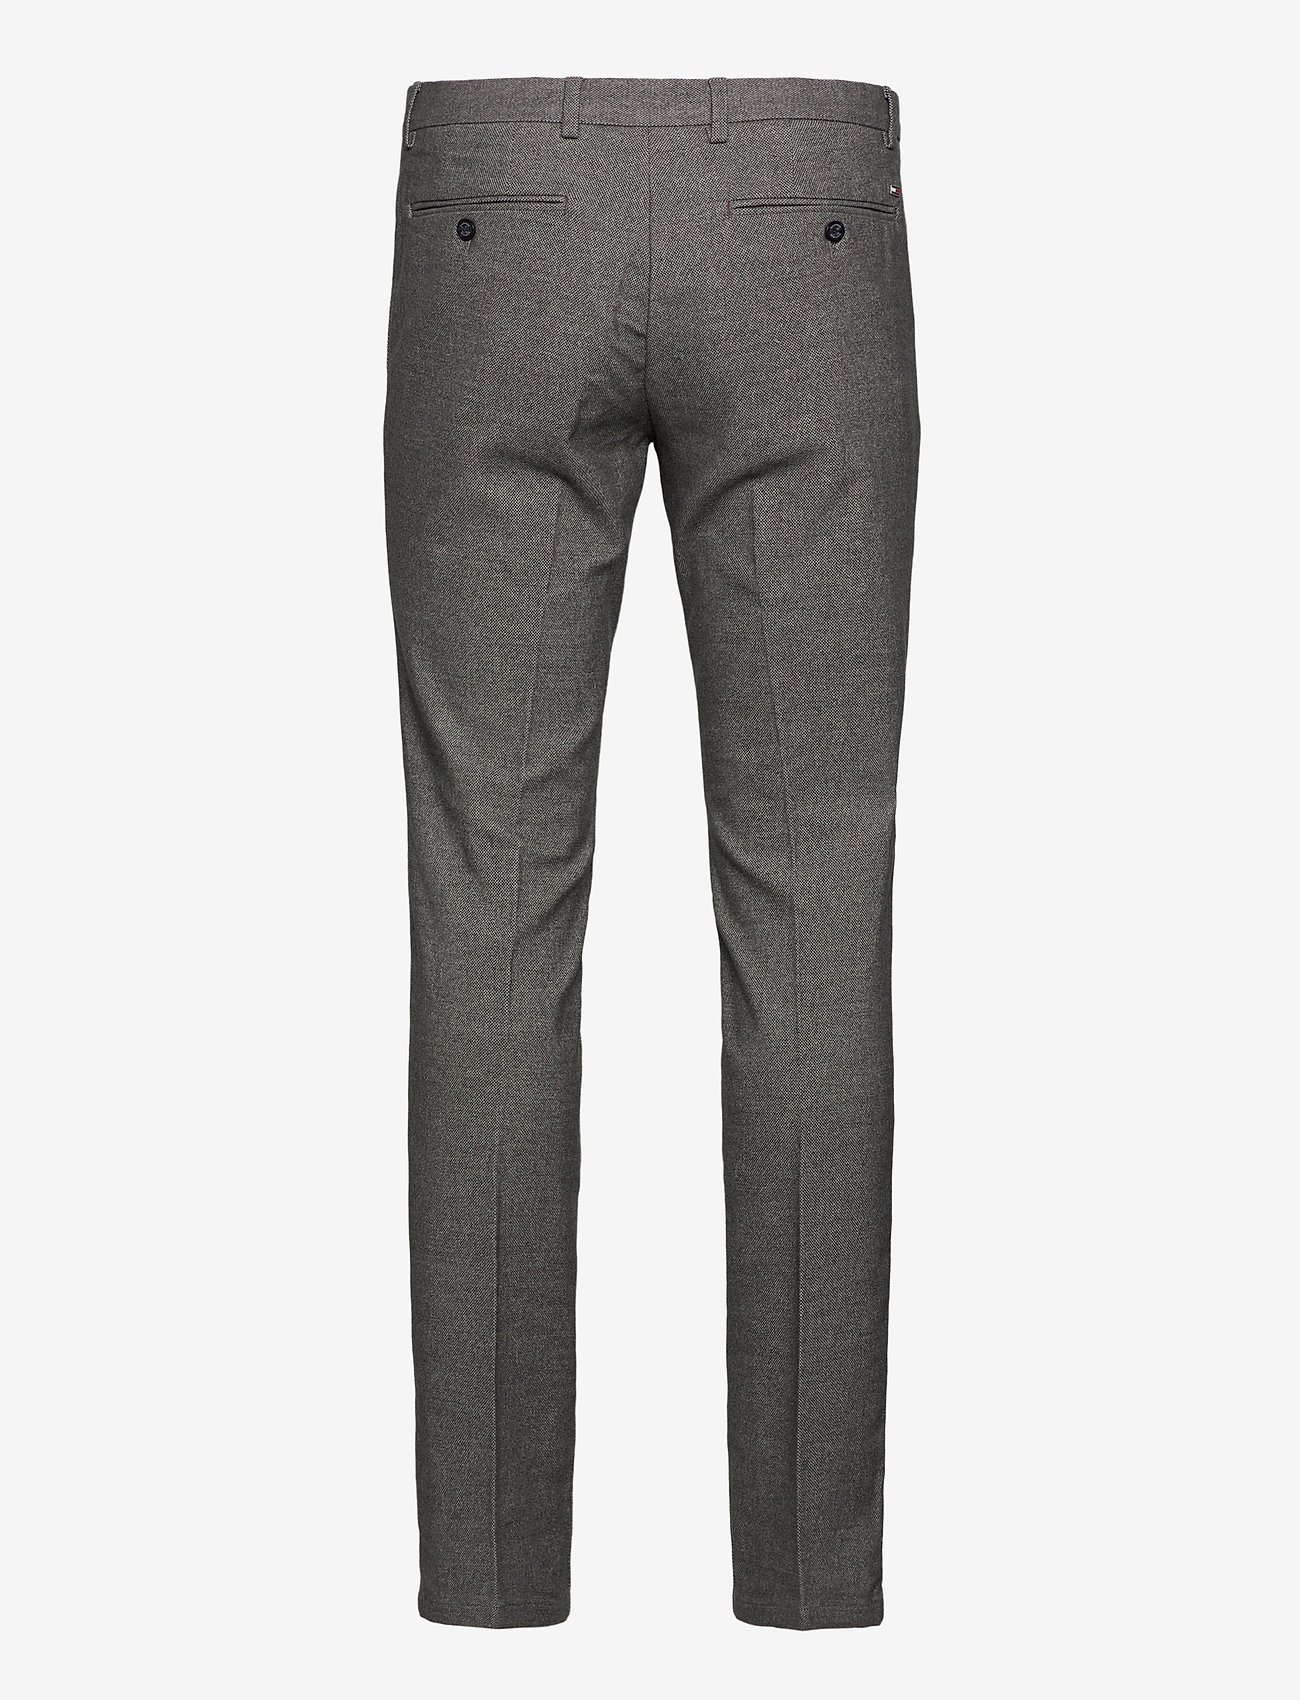 Tommy Hilfiger - DENTON CHINO WOOL LOOK FLEX - suit trousers - beige - 1